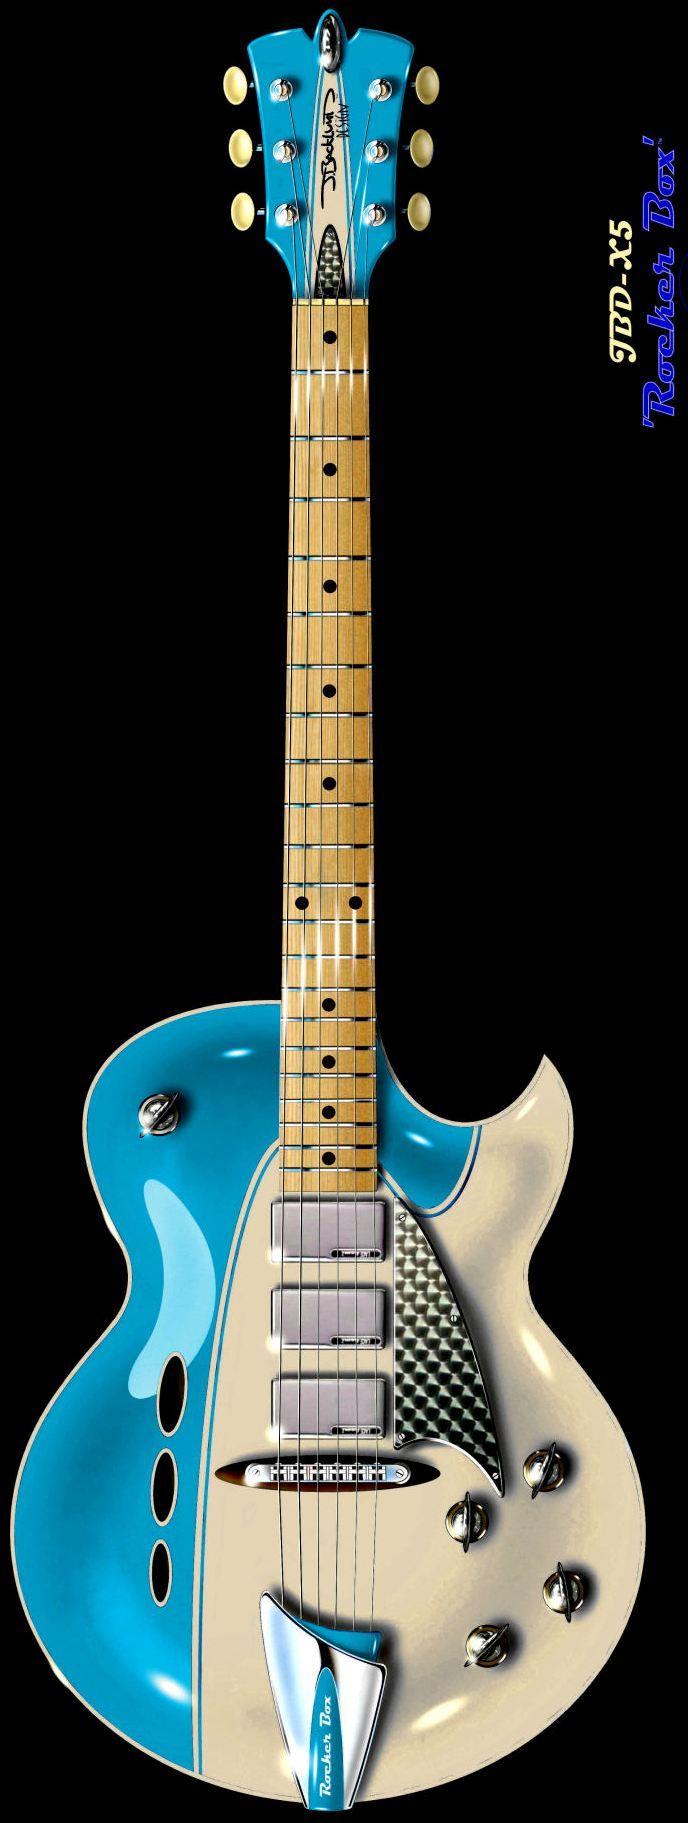 J Backlund Rocket Box #LardysWishlists #Guitar ~ https://www.pinterest.com/lardyfatboy/ ~